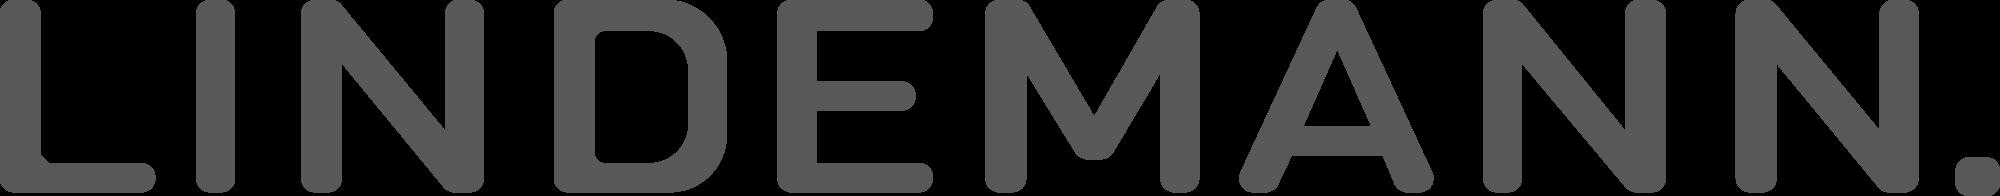 Lindemann logo